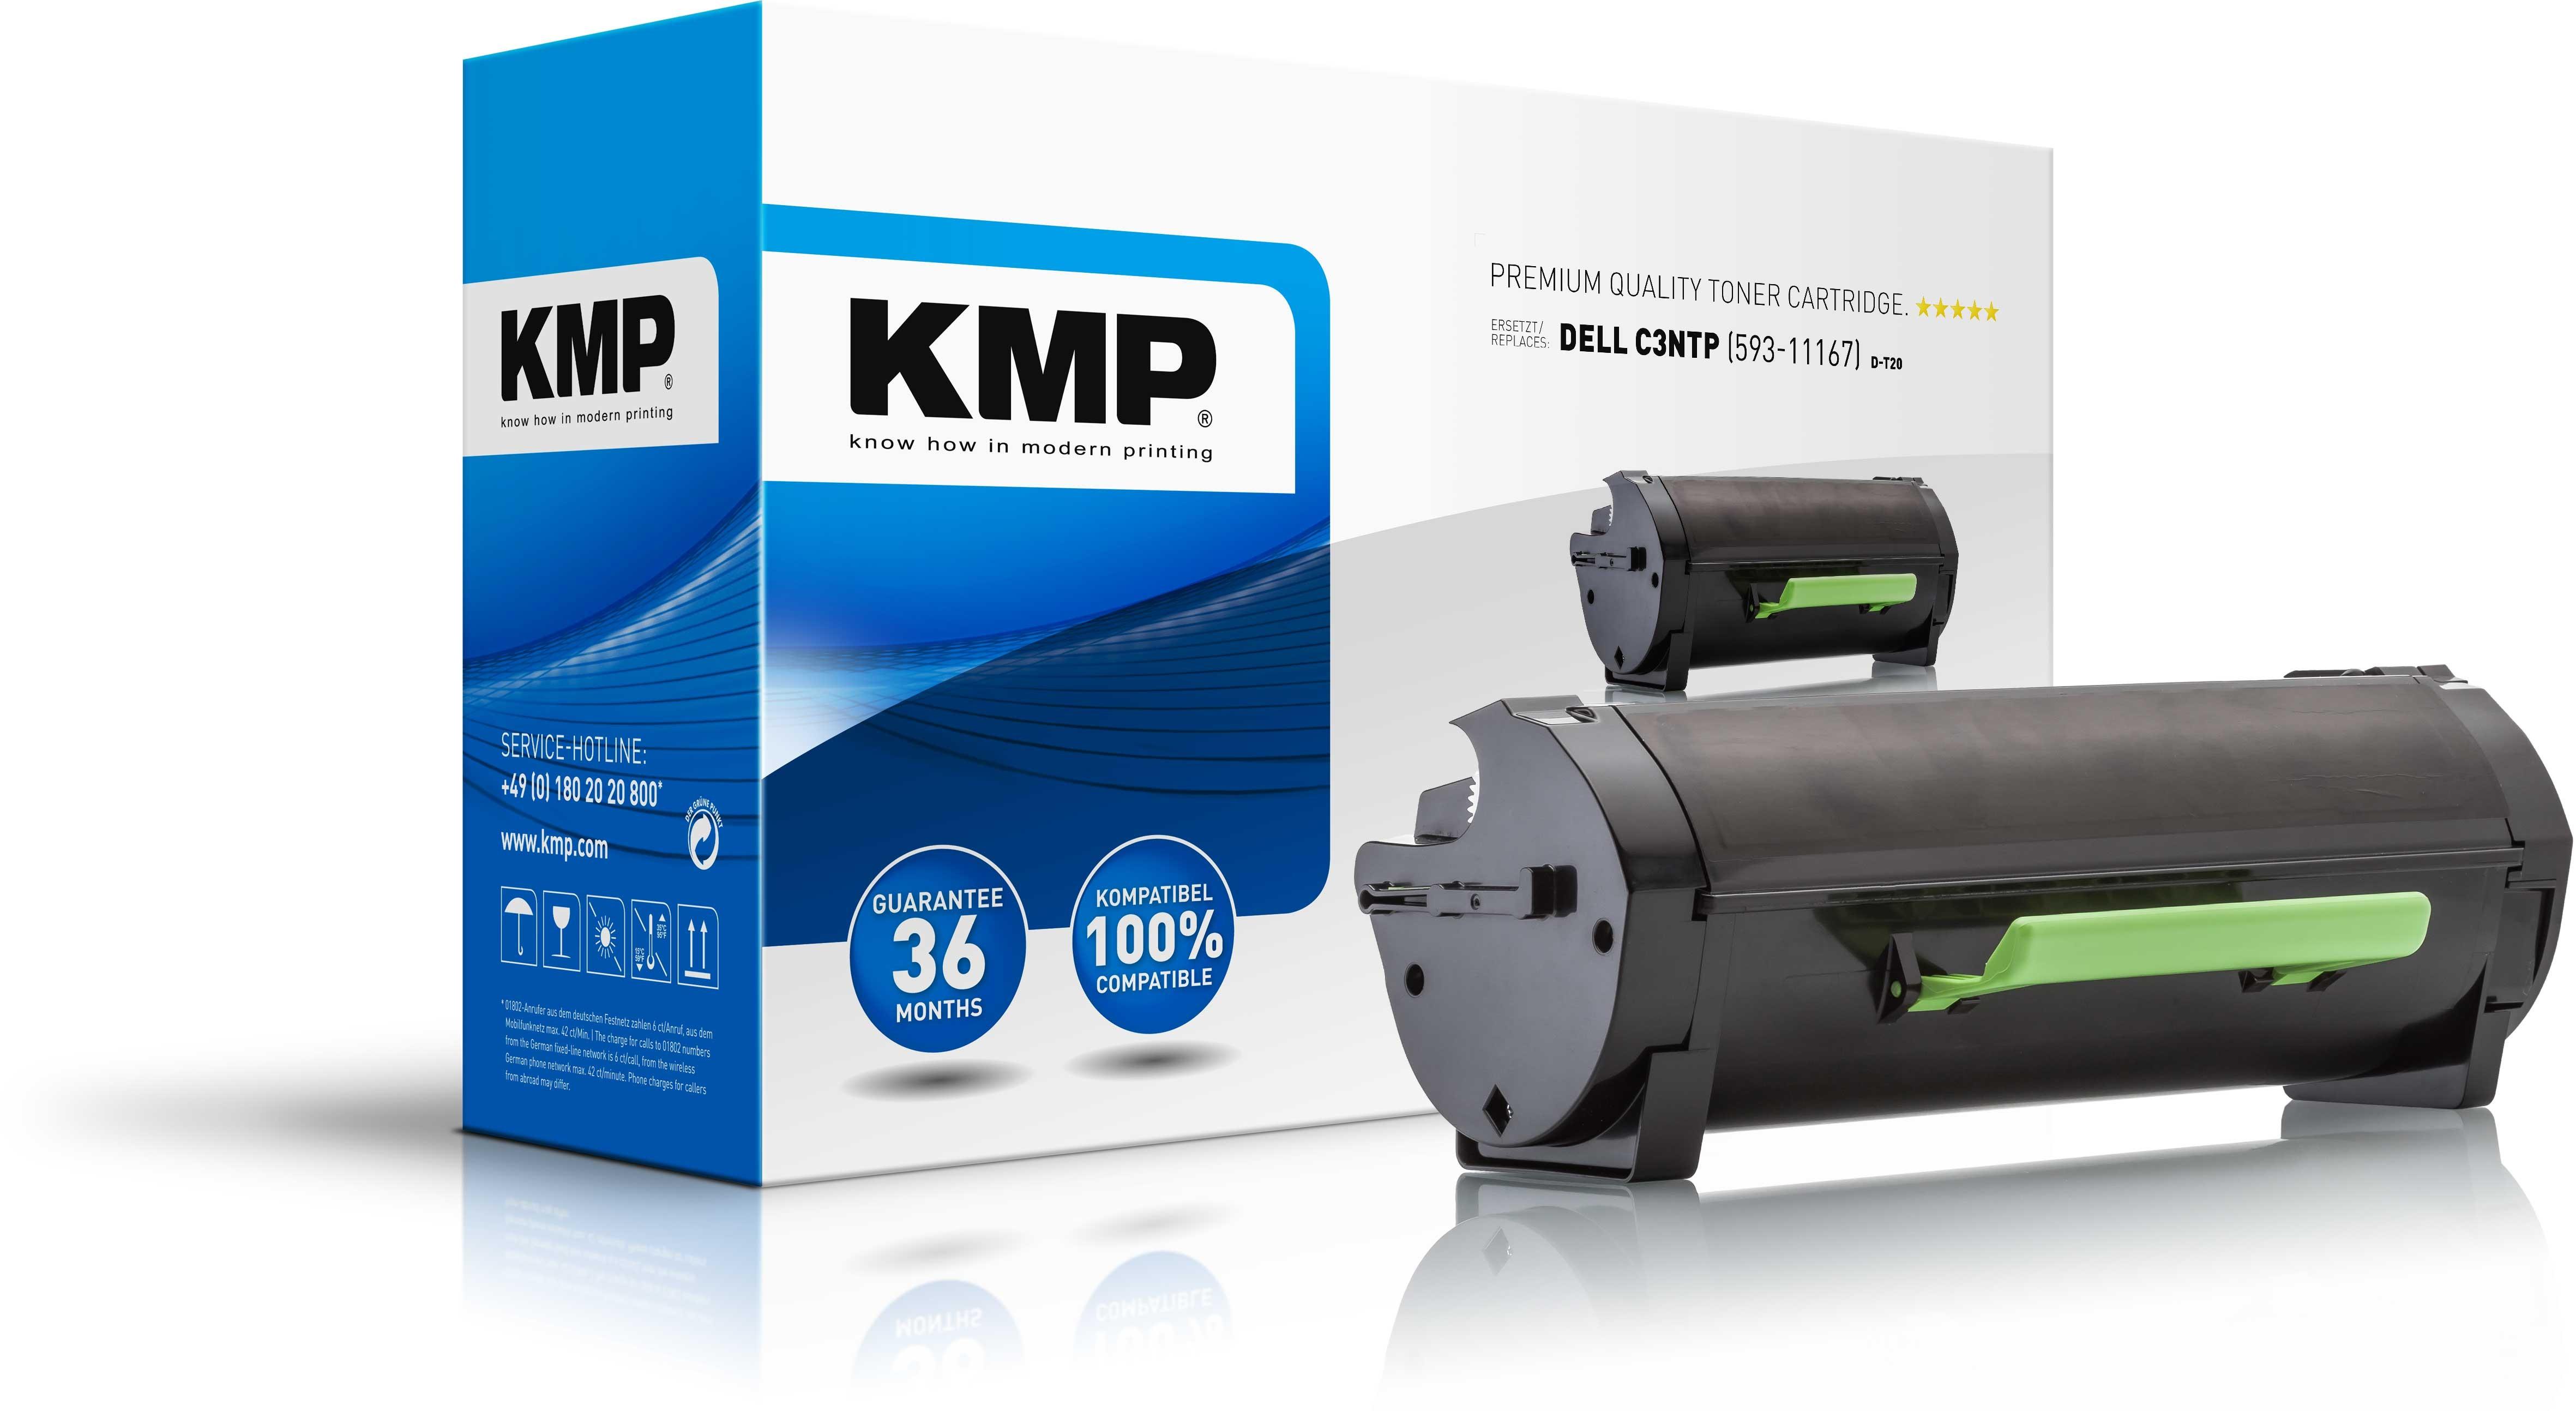 Vorschau: KMP Toner D-T20 für Dell C3NTP B2360d etc. Black